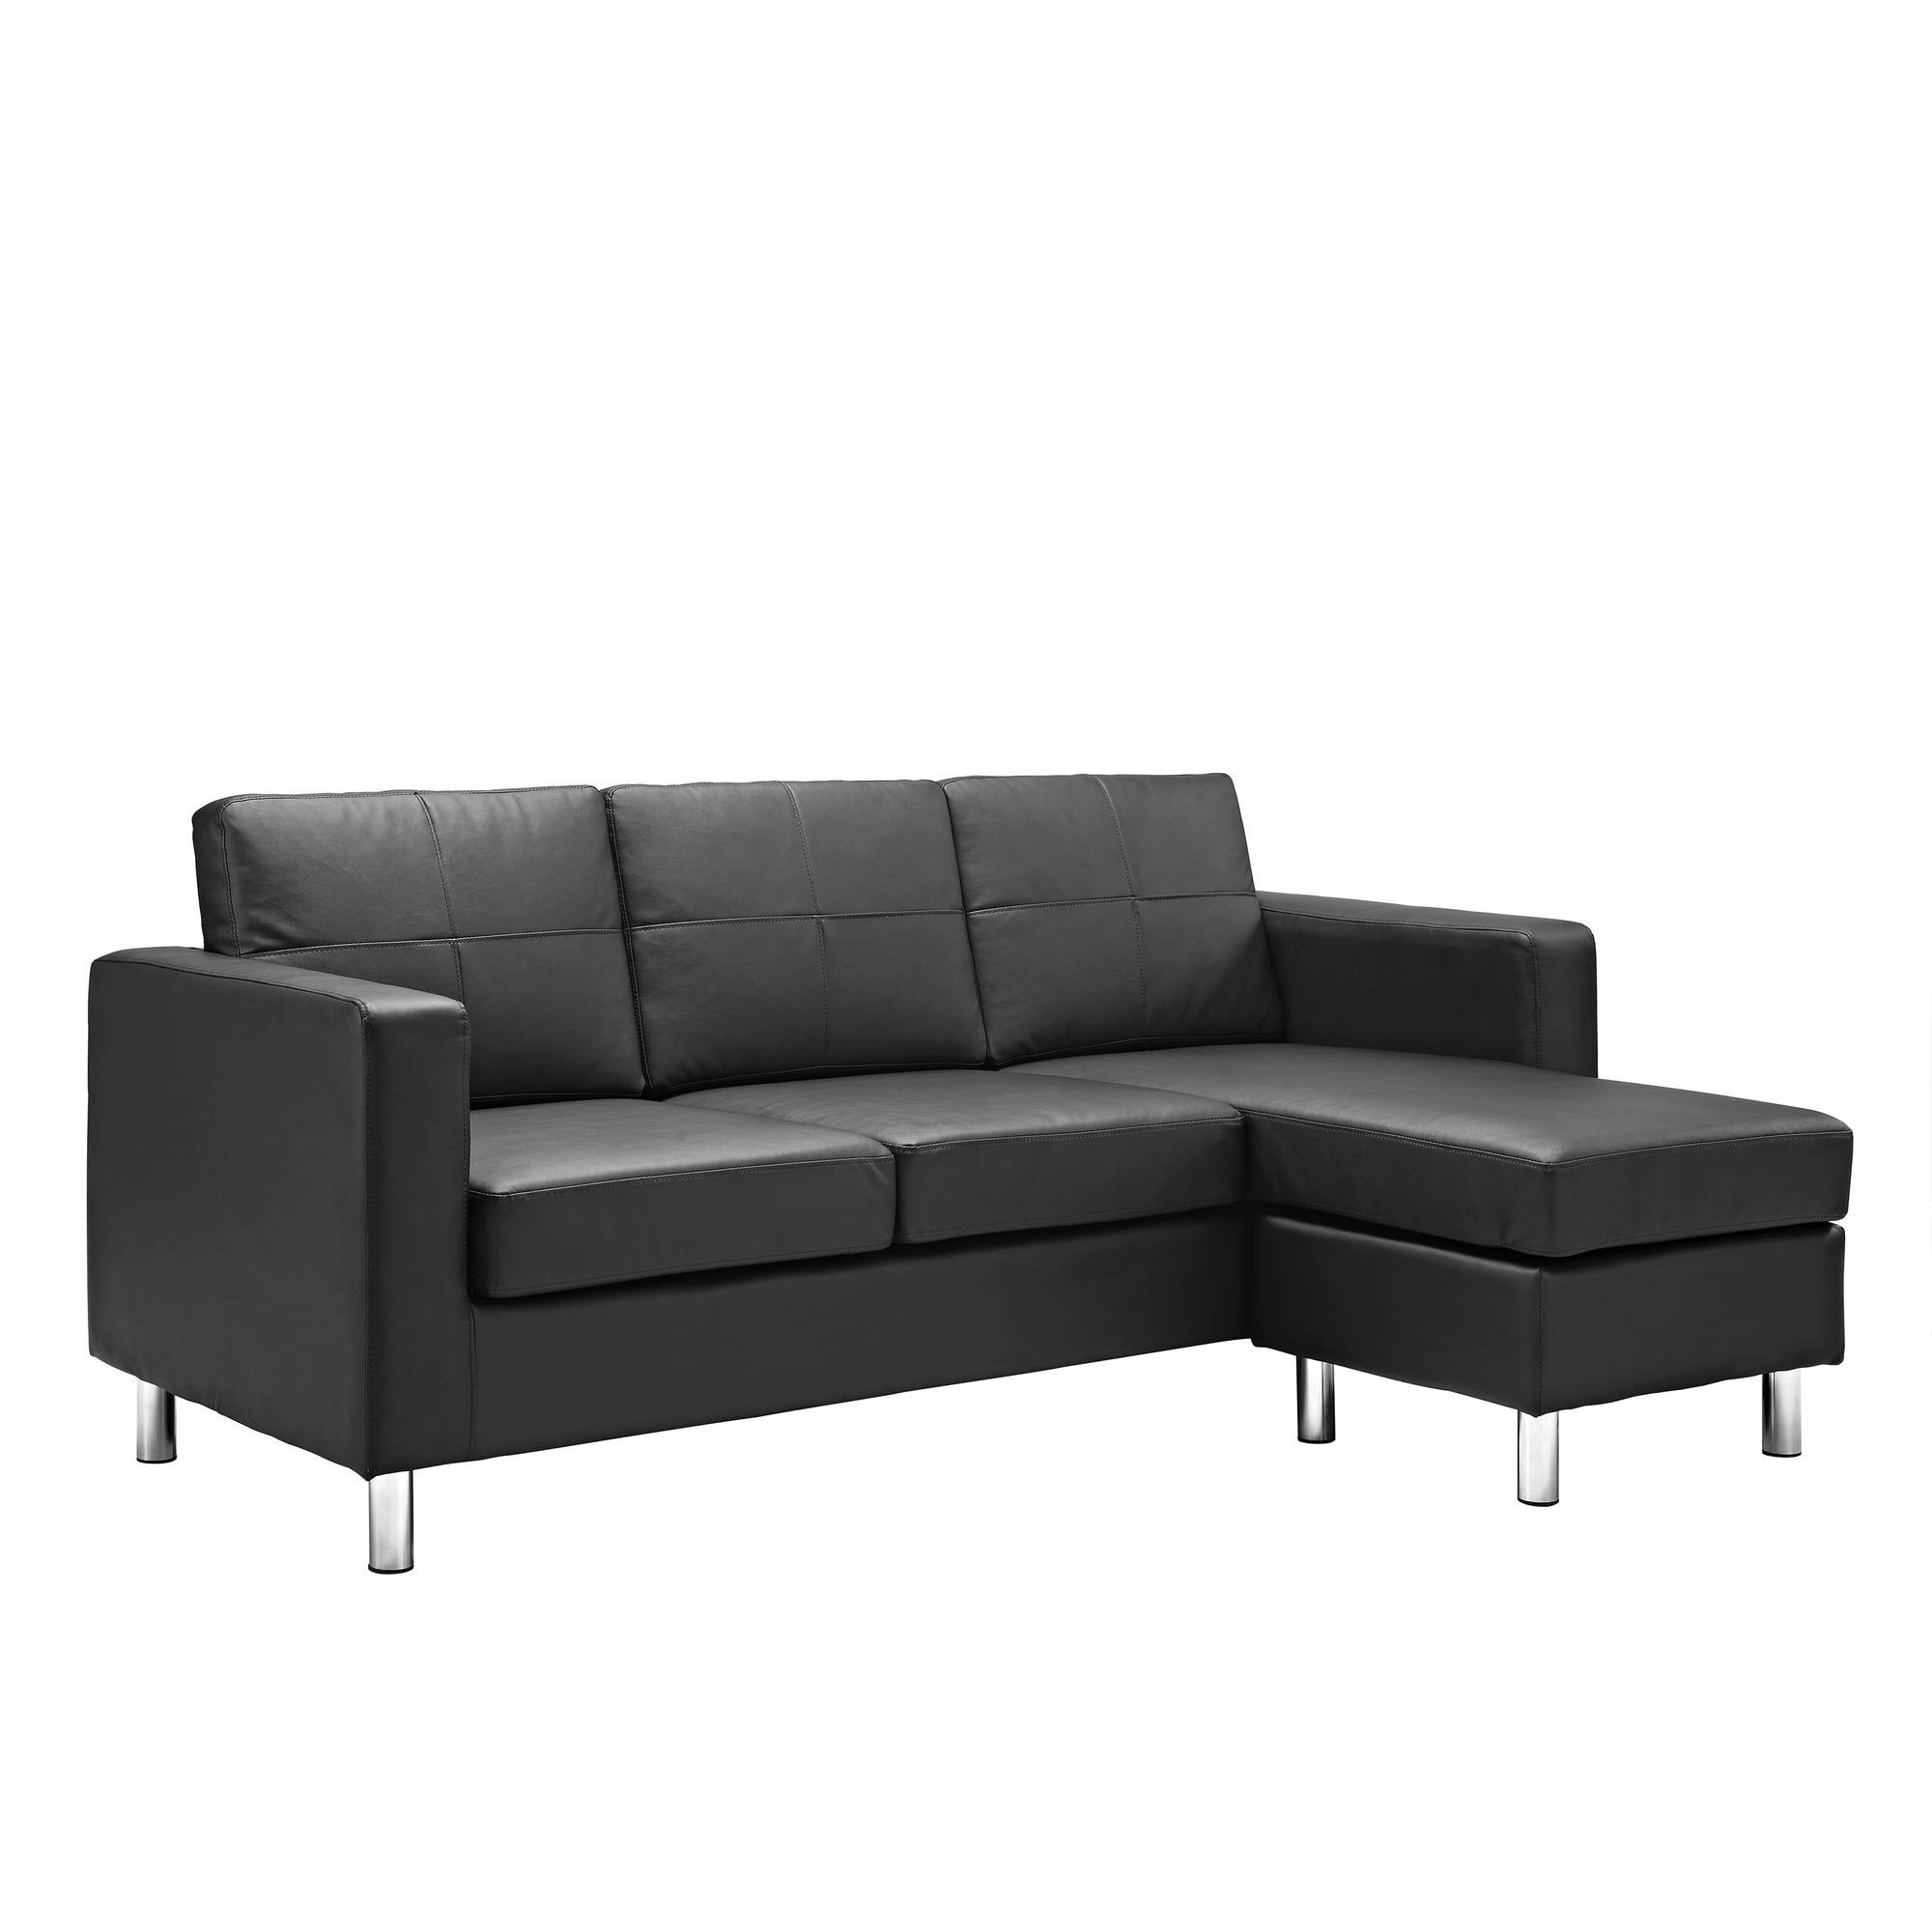 Fresh Gray Sectional Sofa Walmart – Mediasupload Inside Sectional Sofas At Walmart (Image 3 of 10)